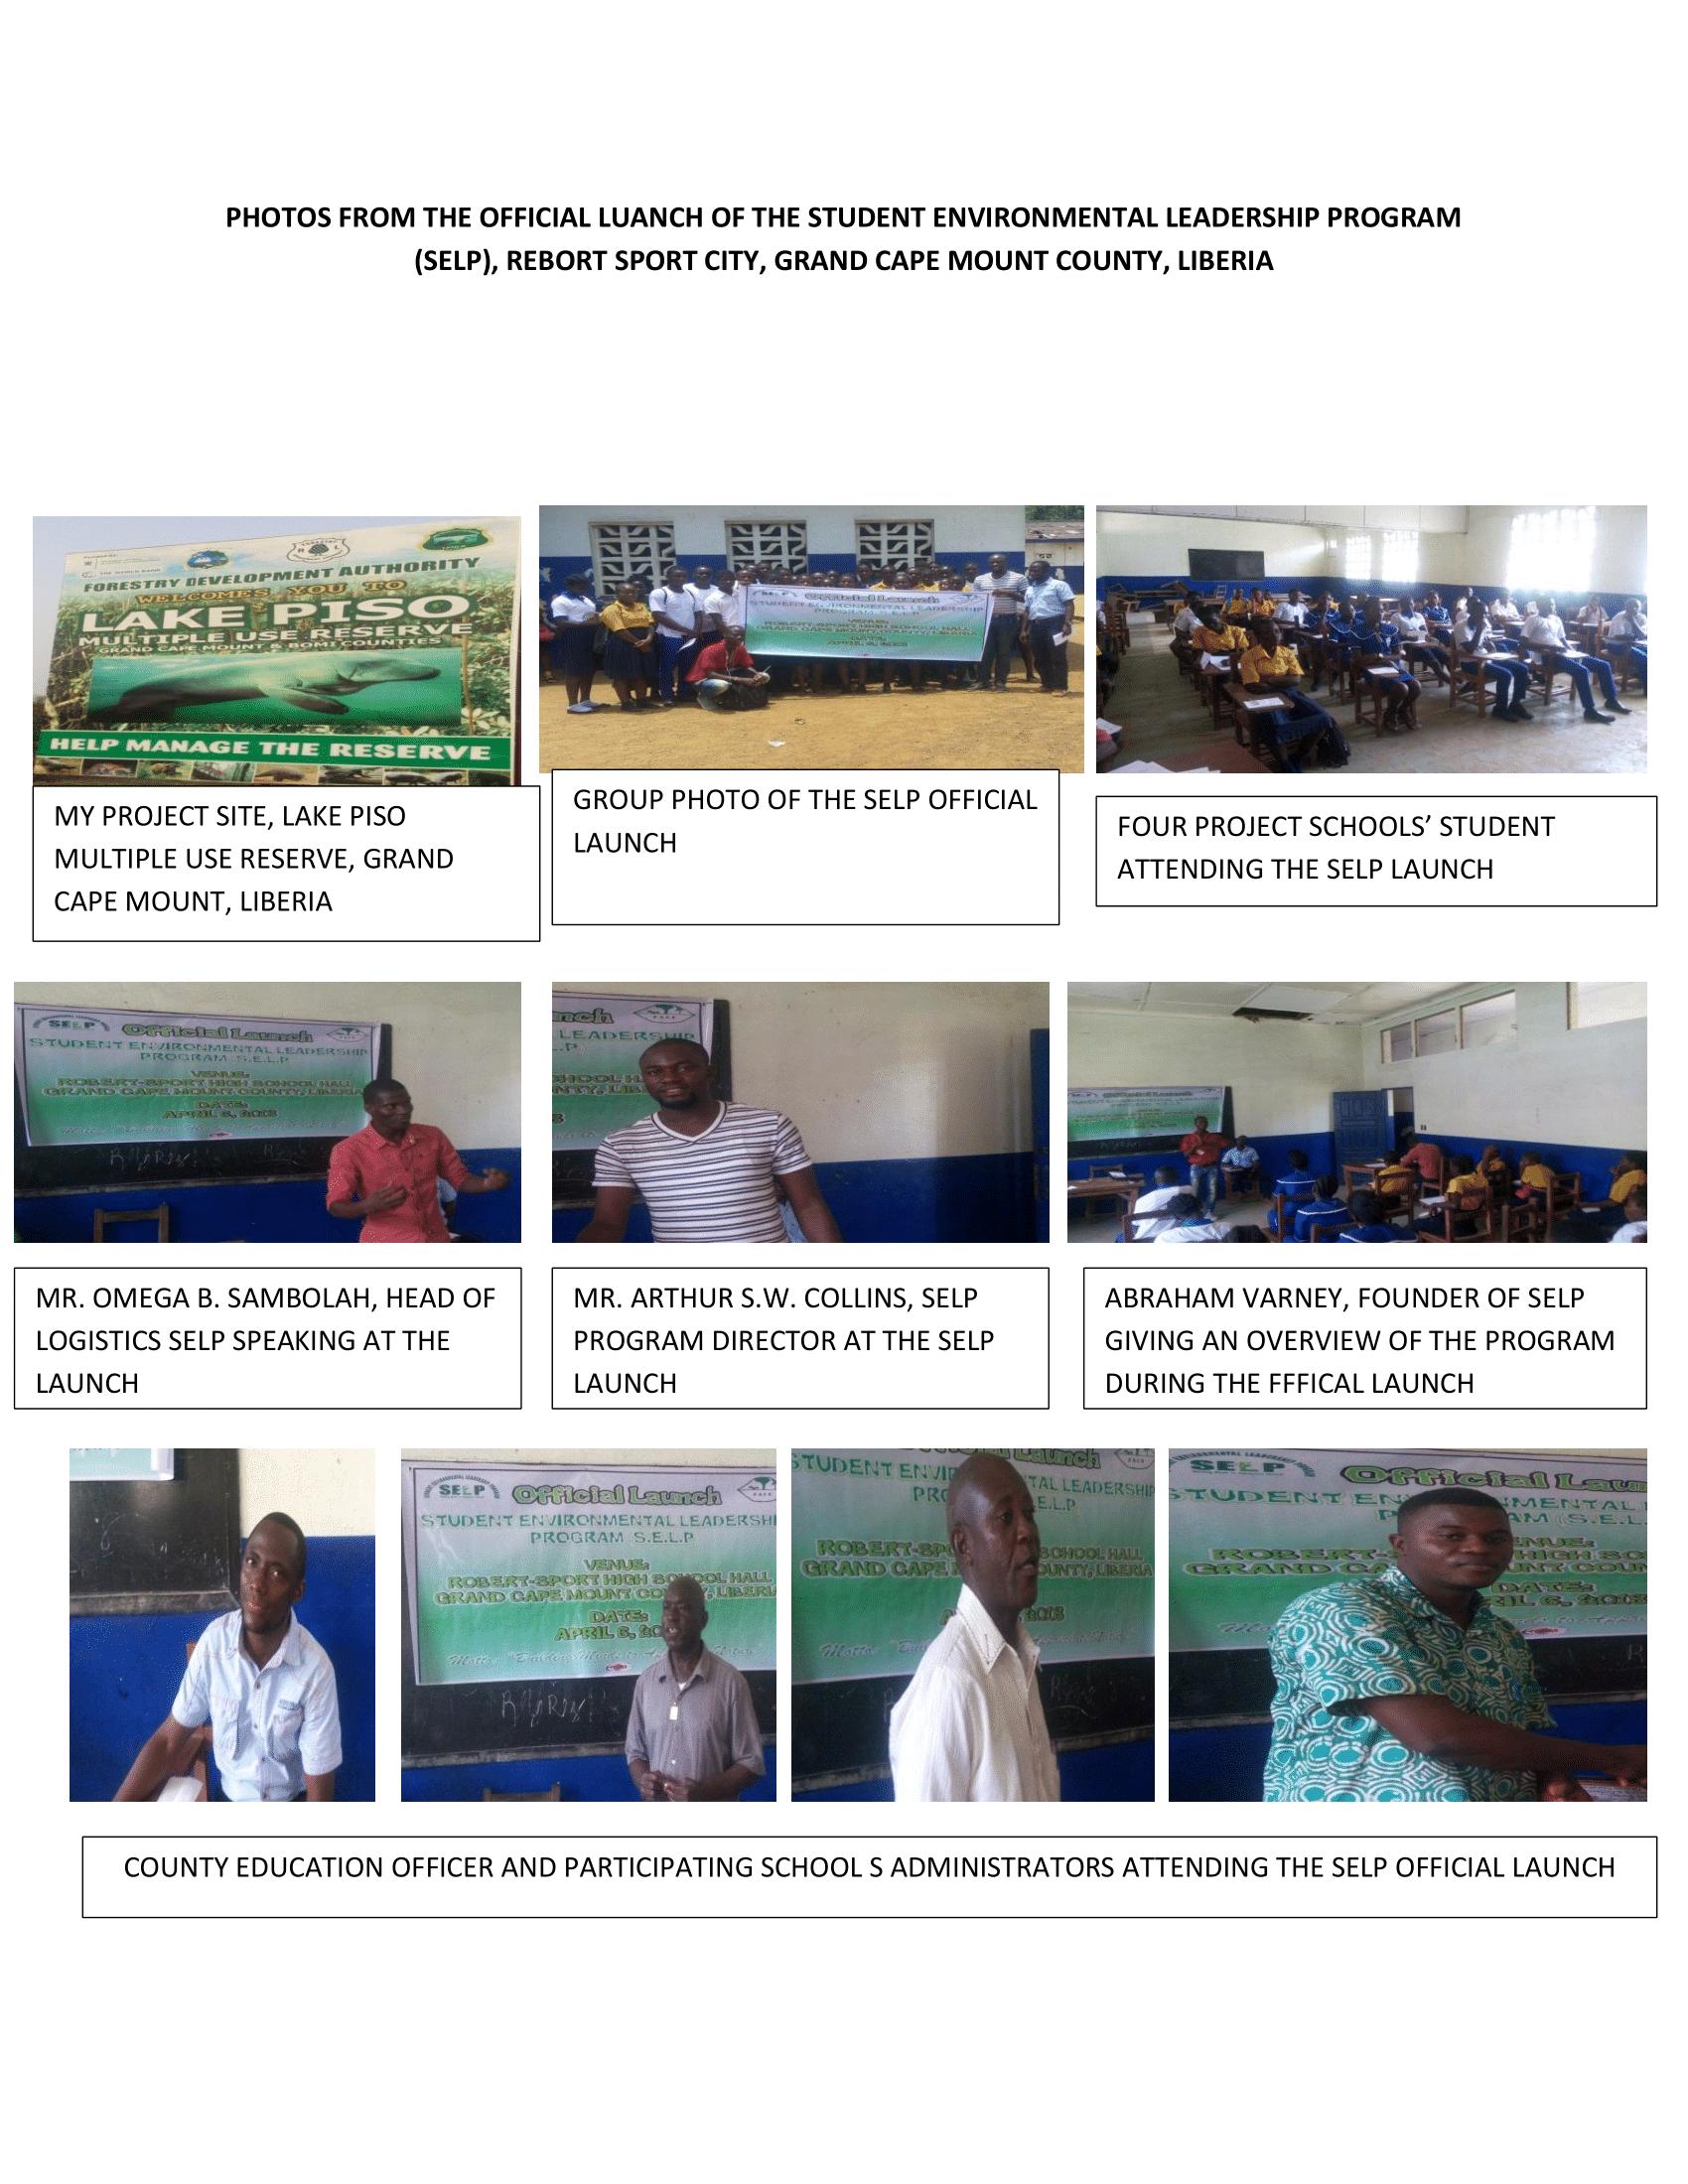 Abraham Varney-Official Launch Student Environmental Leadership Program-in-Liberia - Abraham Varney-1.png